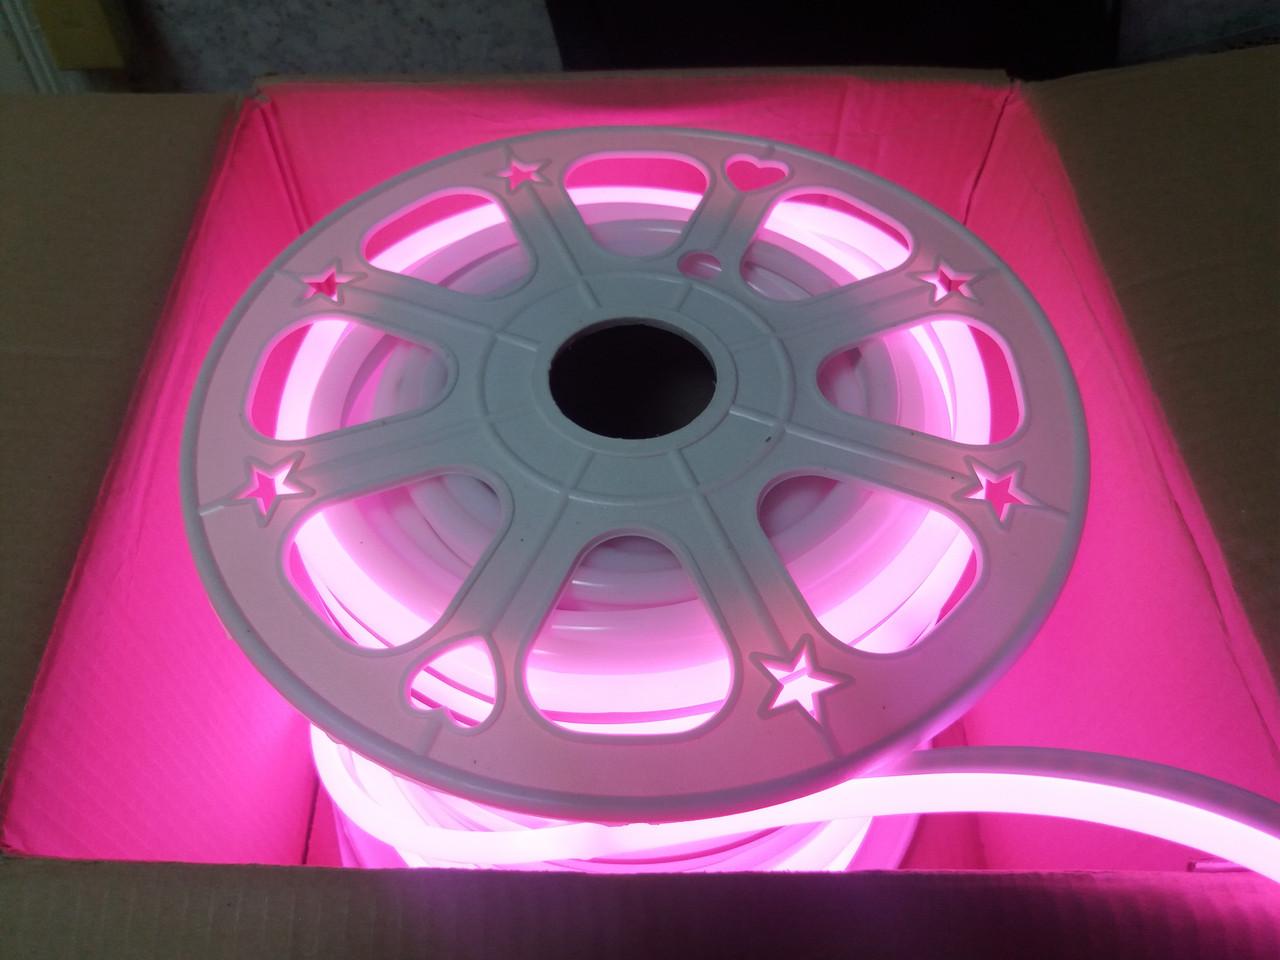 Гибкий Лед Неон 24V Розовый Pink IP68